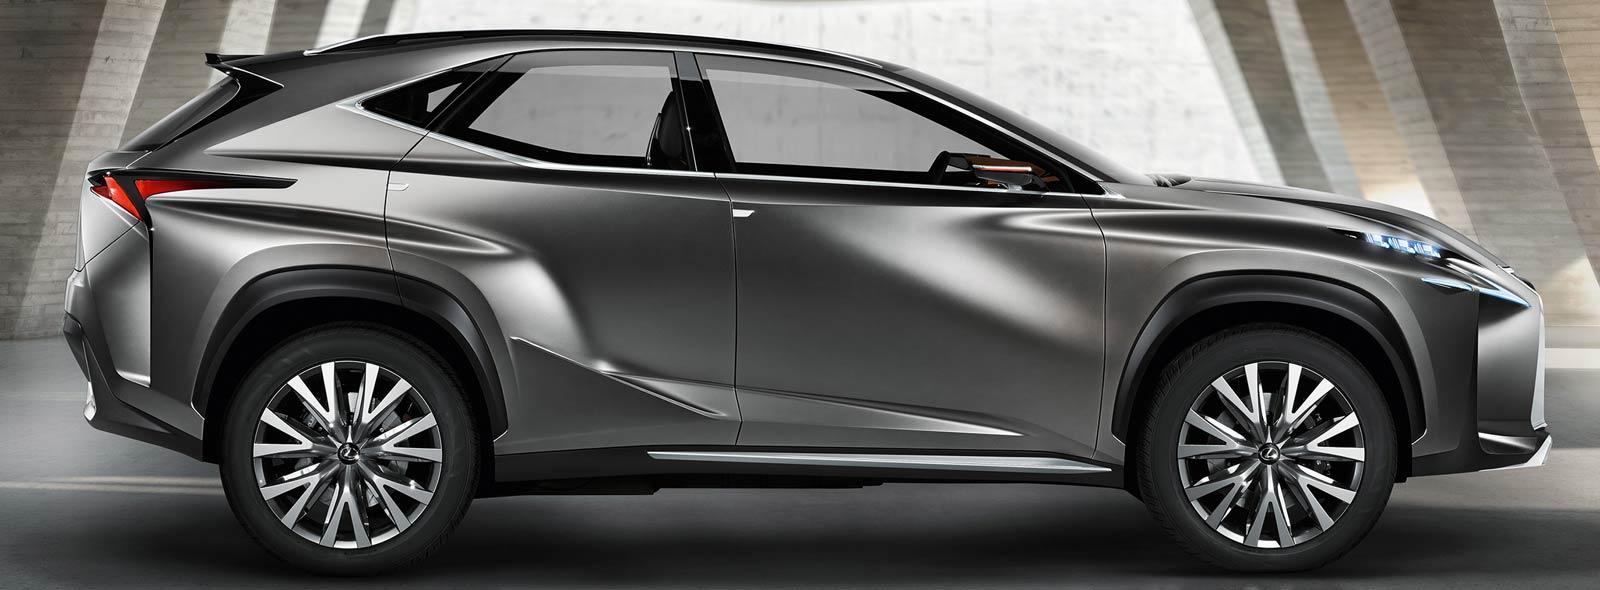 Lexus LF NX Concept SUV Side